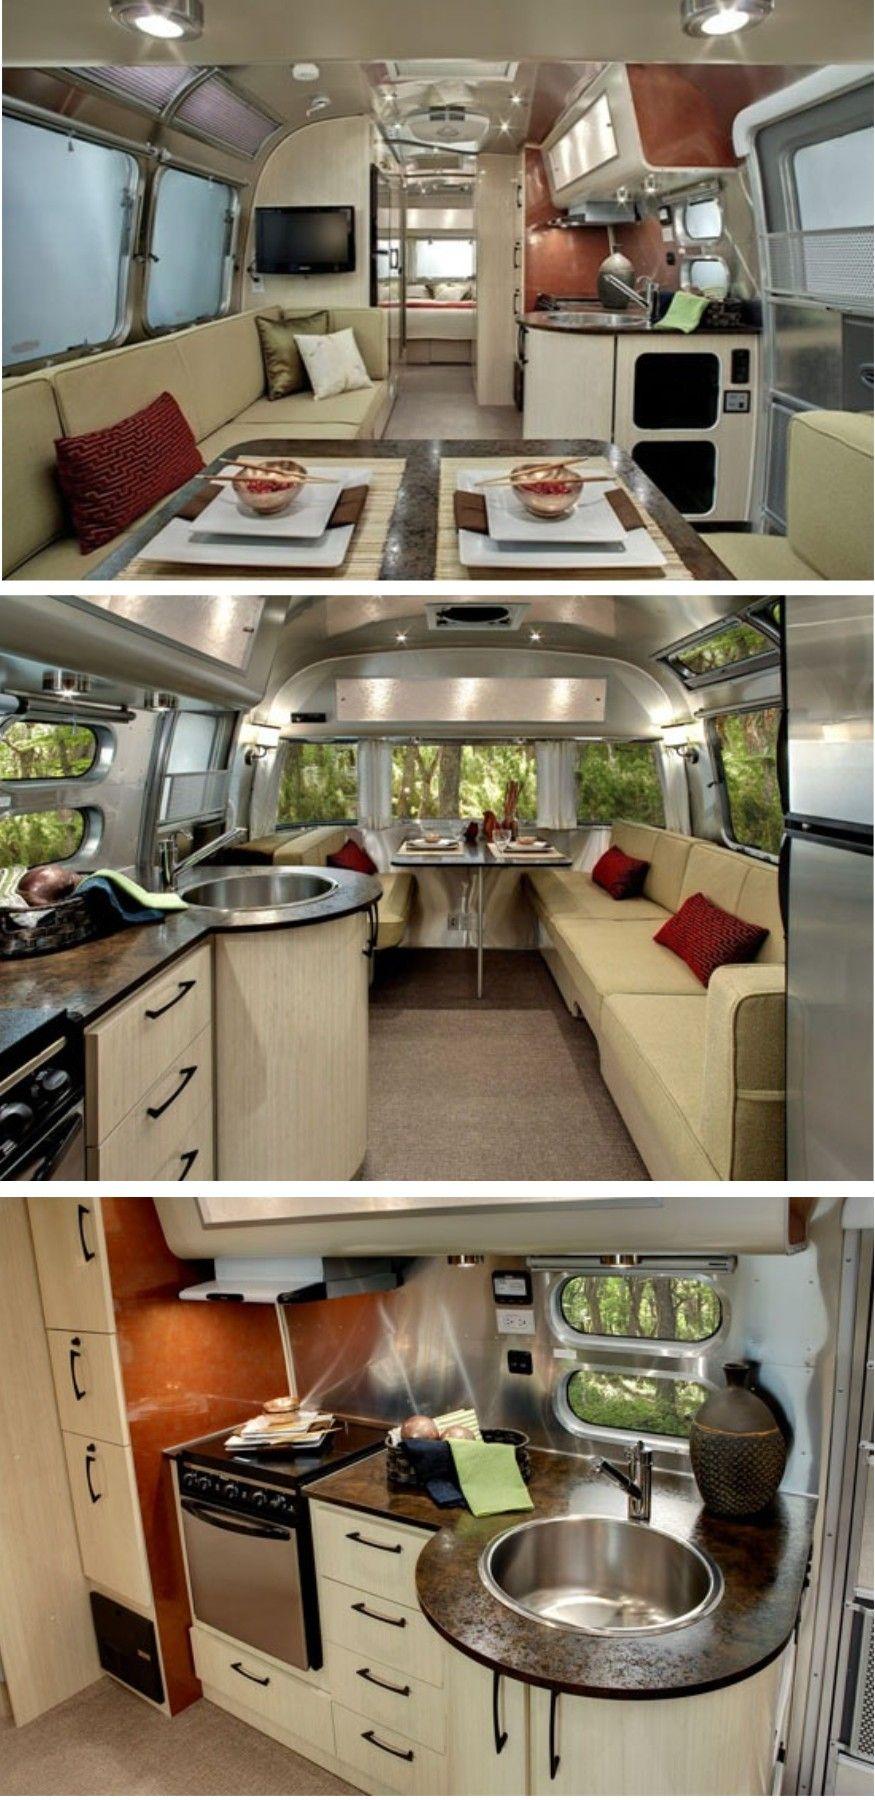 airstreaming am nagement int rieur pinterest caravane camping car et camping. Black Bedroom Furniture Sets. Home Design Ideas